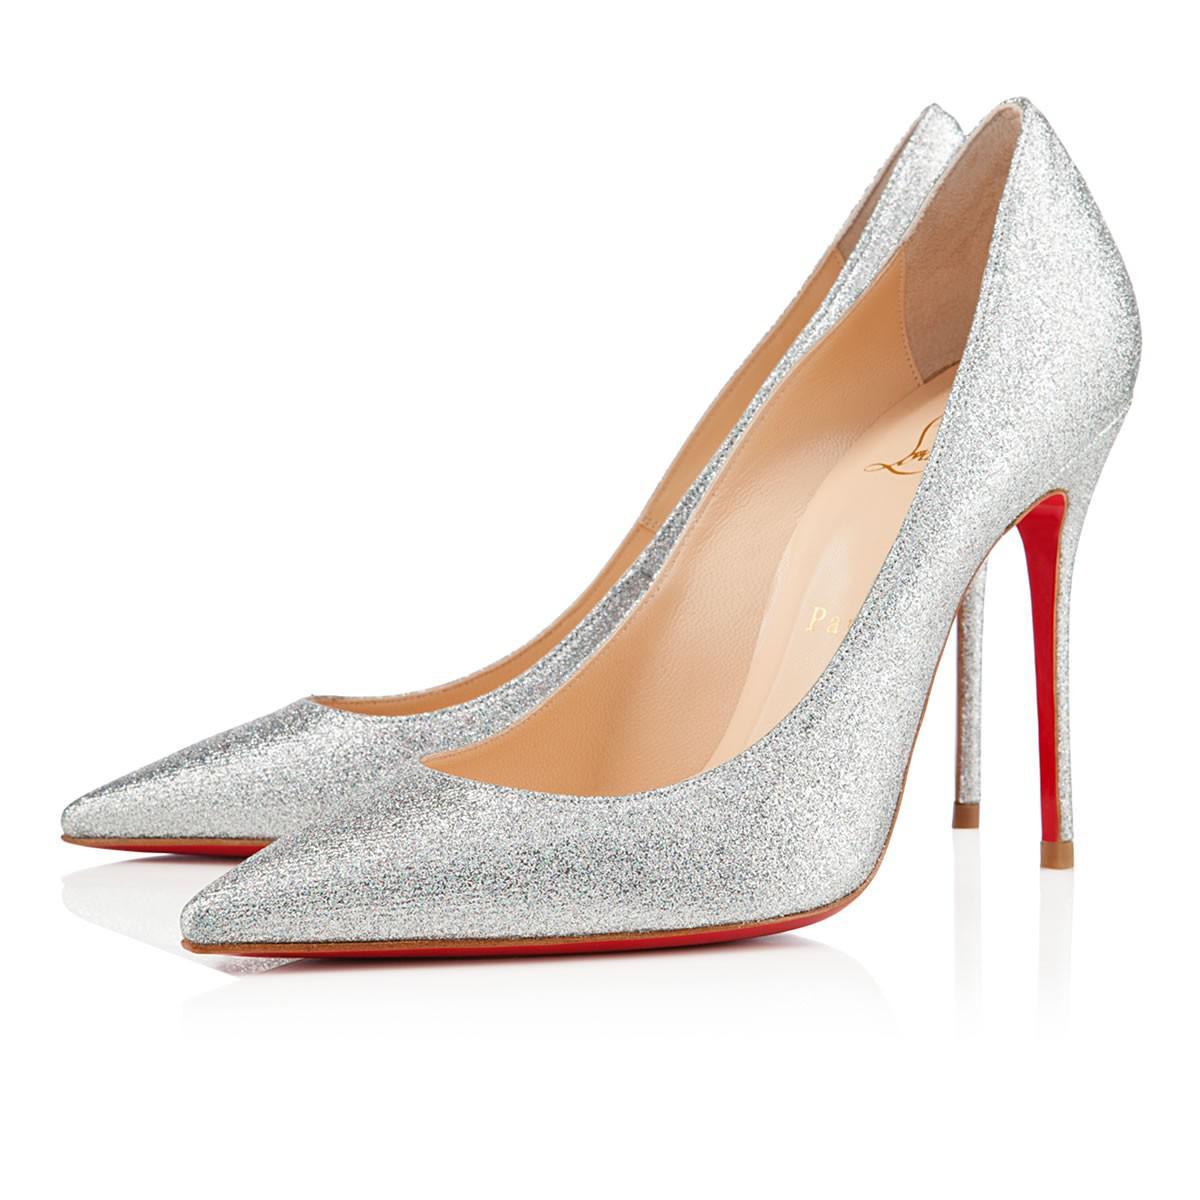 9c056be86f24 Christian Louboutin. Women s Metallic Decollete 554 Glitter Mini 100 Silver  Glitter Canvas